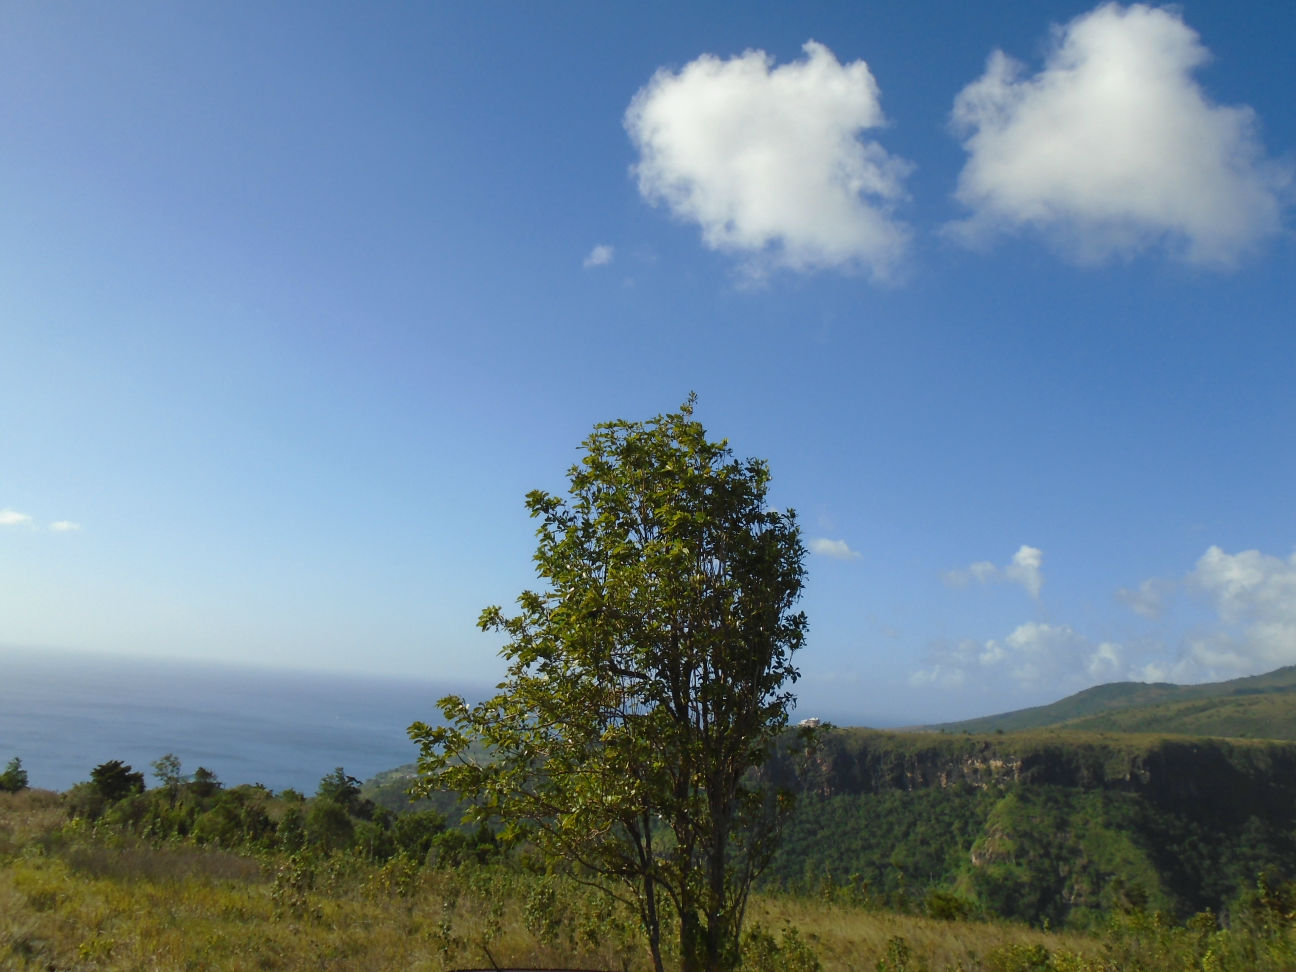 Dominica Real Estate: 1 acre land for sale at Cuba Road, Mero